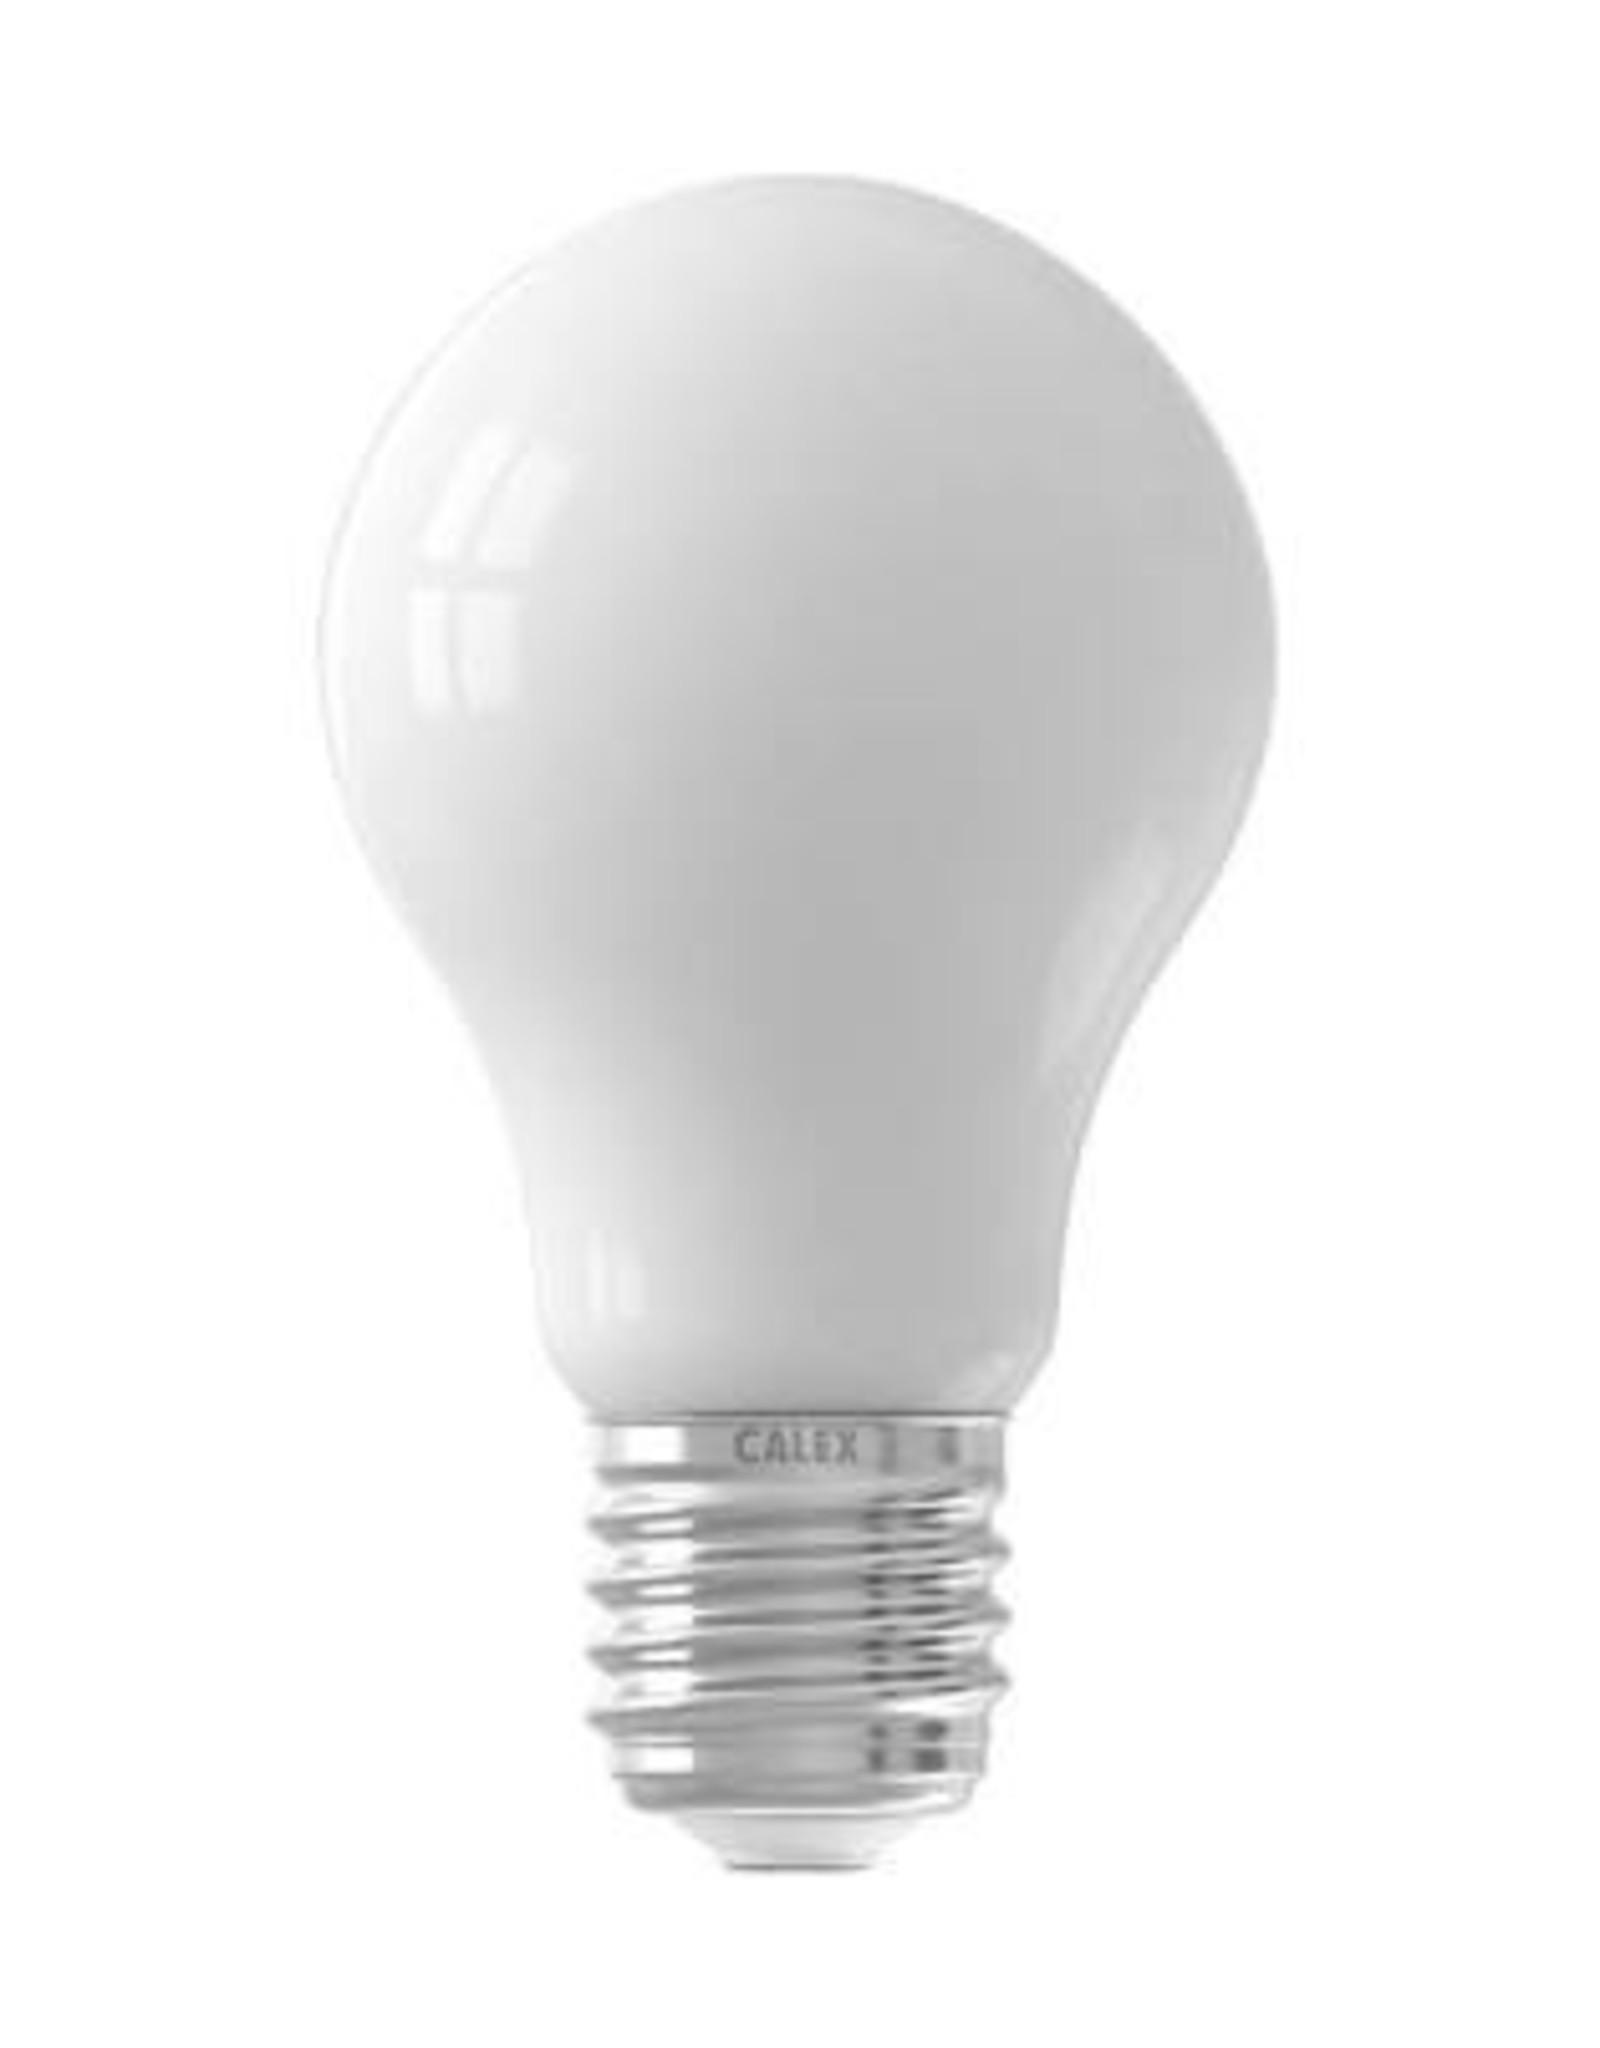 Calex LED Full Glass Filament GLS-lamp 220-240V 4W 390lm E27 A60, Softline 2700K CRI80 Dimmable, energy label A++